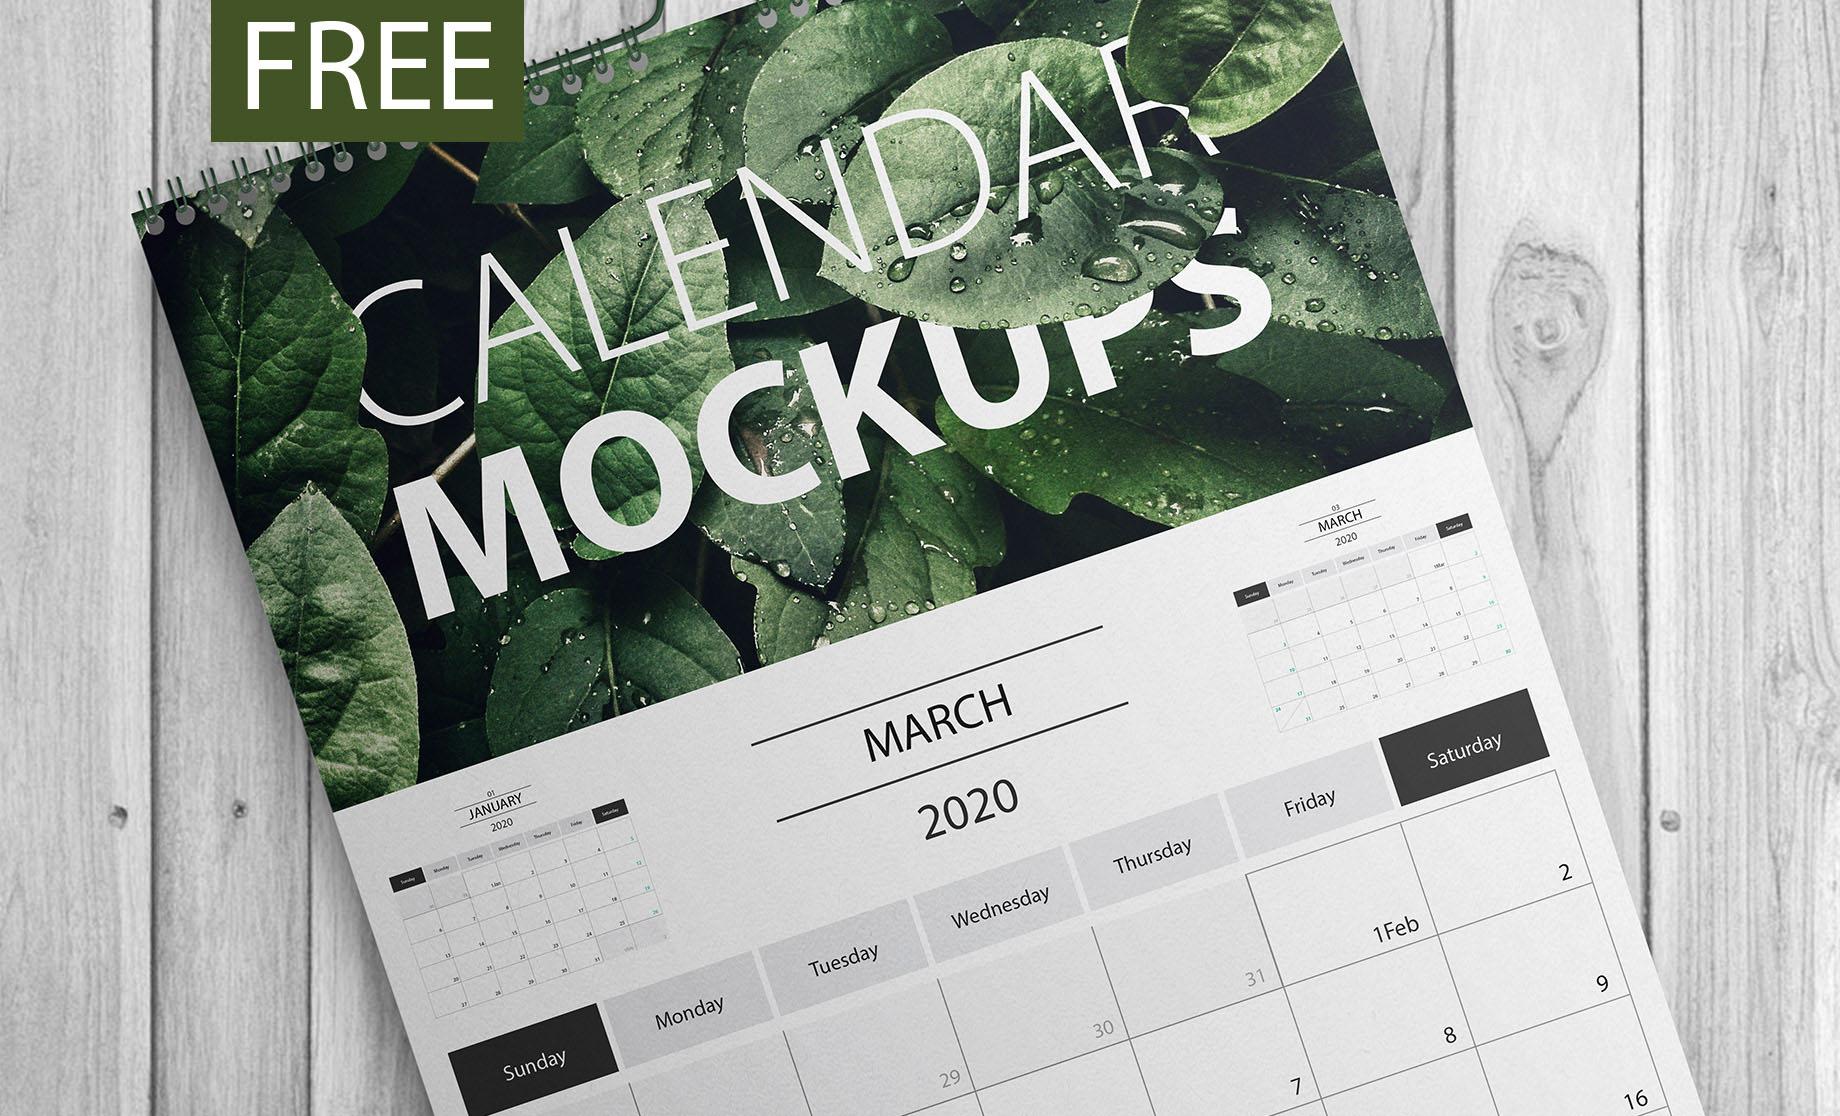 Calendar 2020 Psd 40+Premium and Free PSD Calendar Templates & Mockups to create the